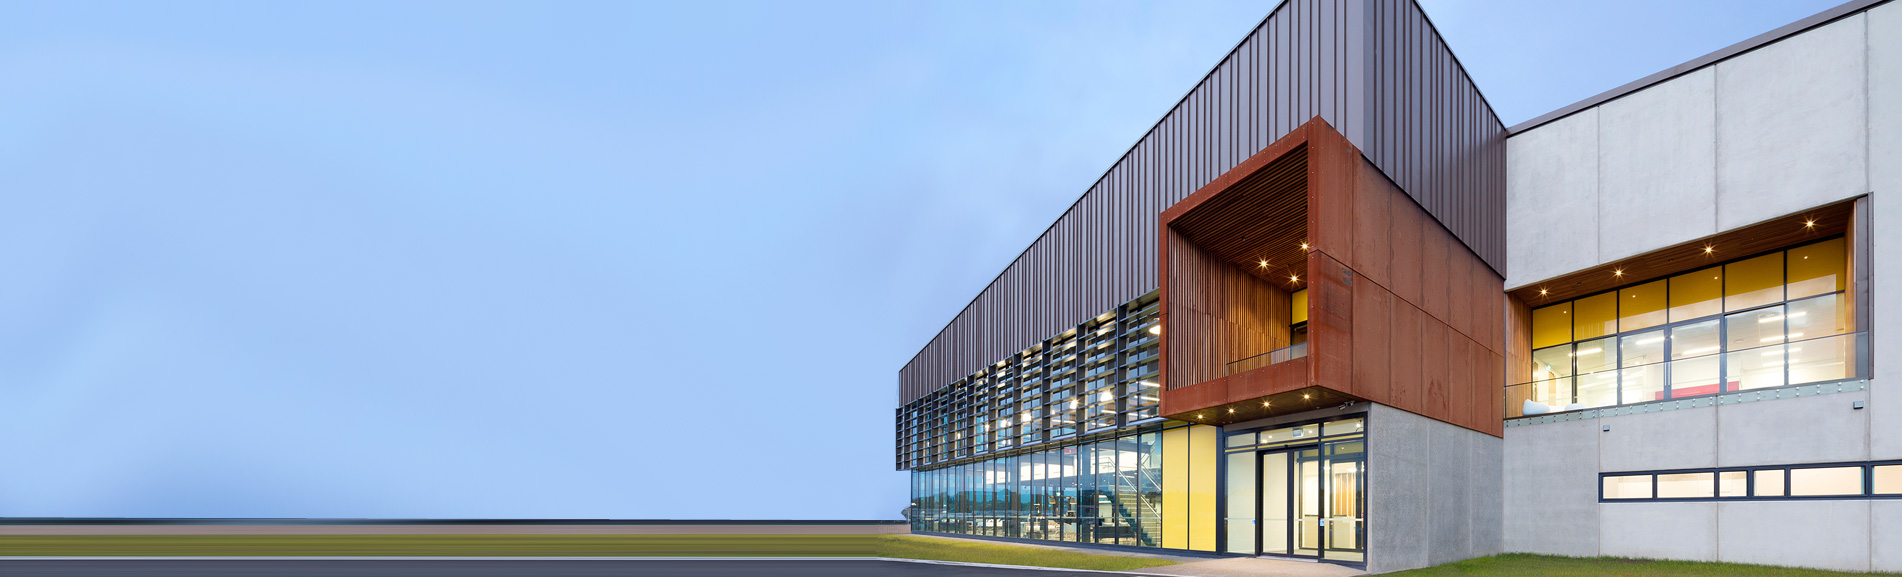 The new Cubro Building in Tauranga. We manufactured the corten steel panels around the balconies.